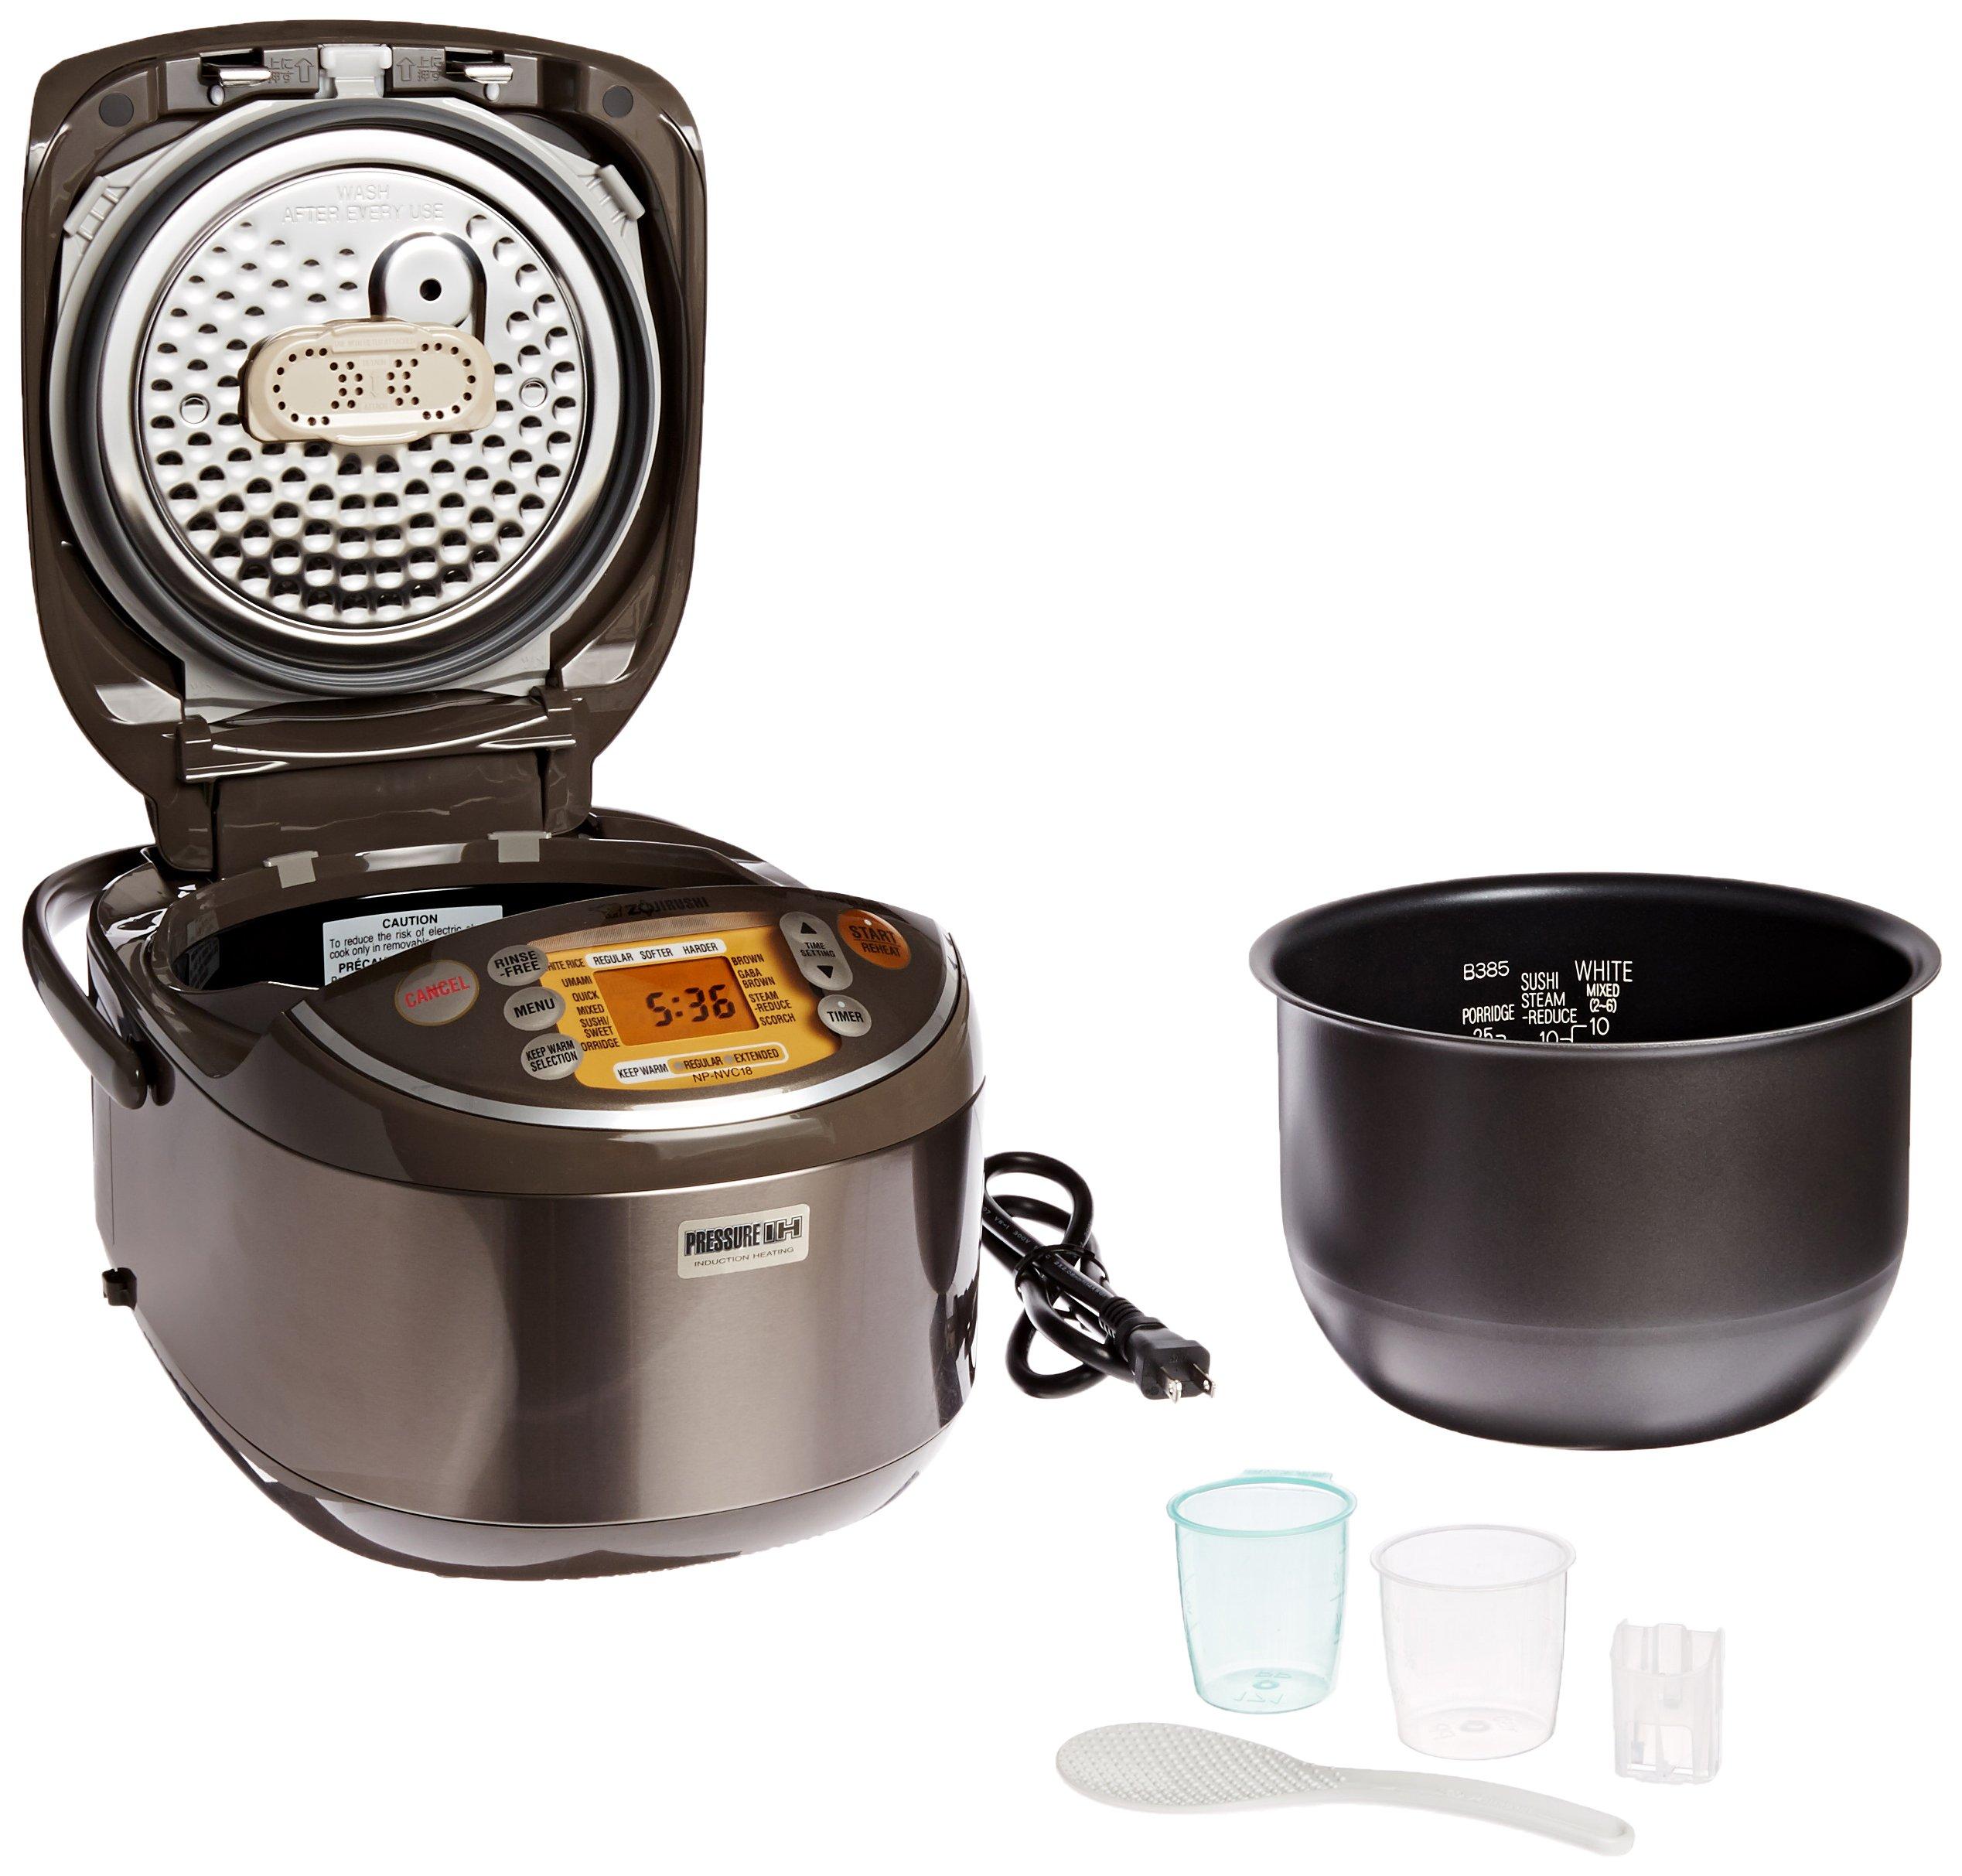 Zojirushi Induction Heating Pressure Rice Cooker & Warmer 1.8 Liter, Stainless Brown NP-NVC18 by Zojirushi (Image #4)